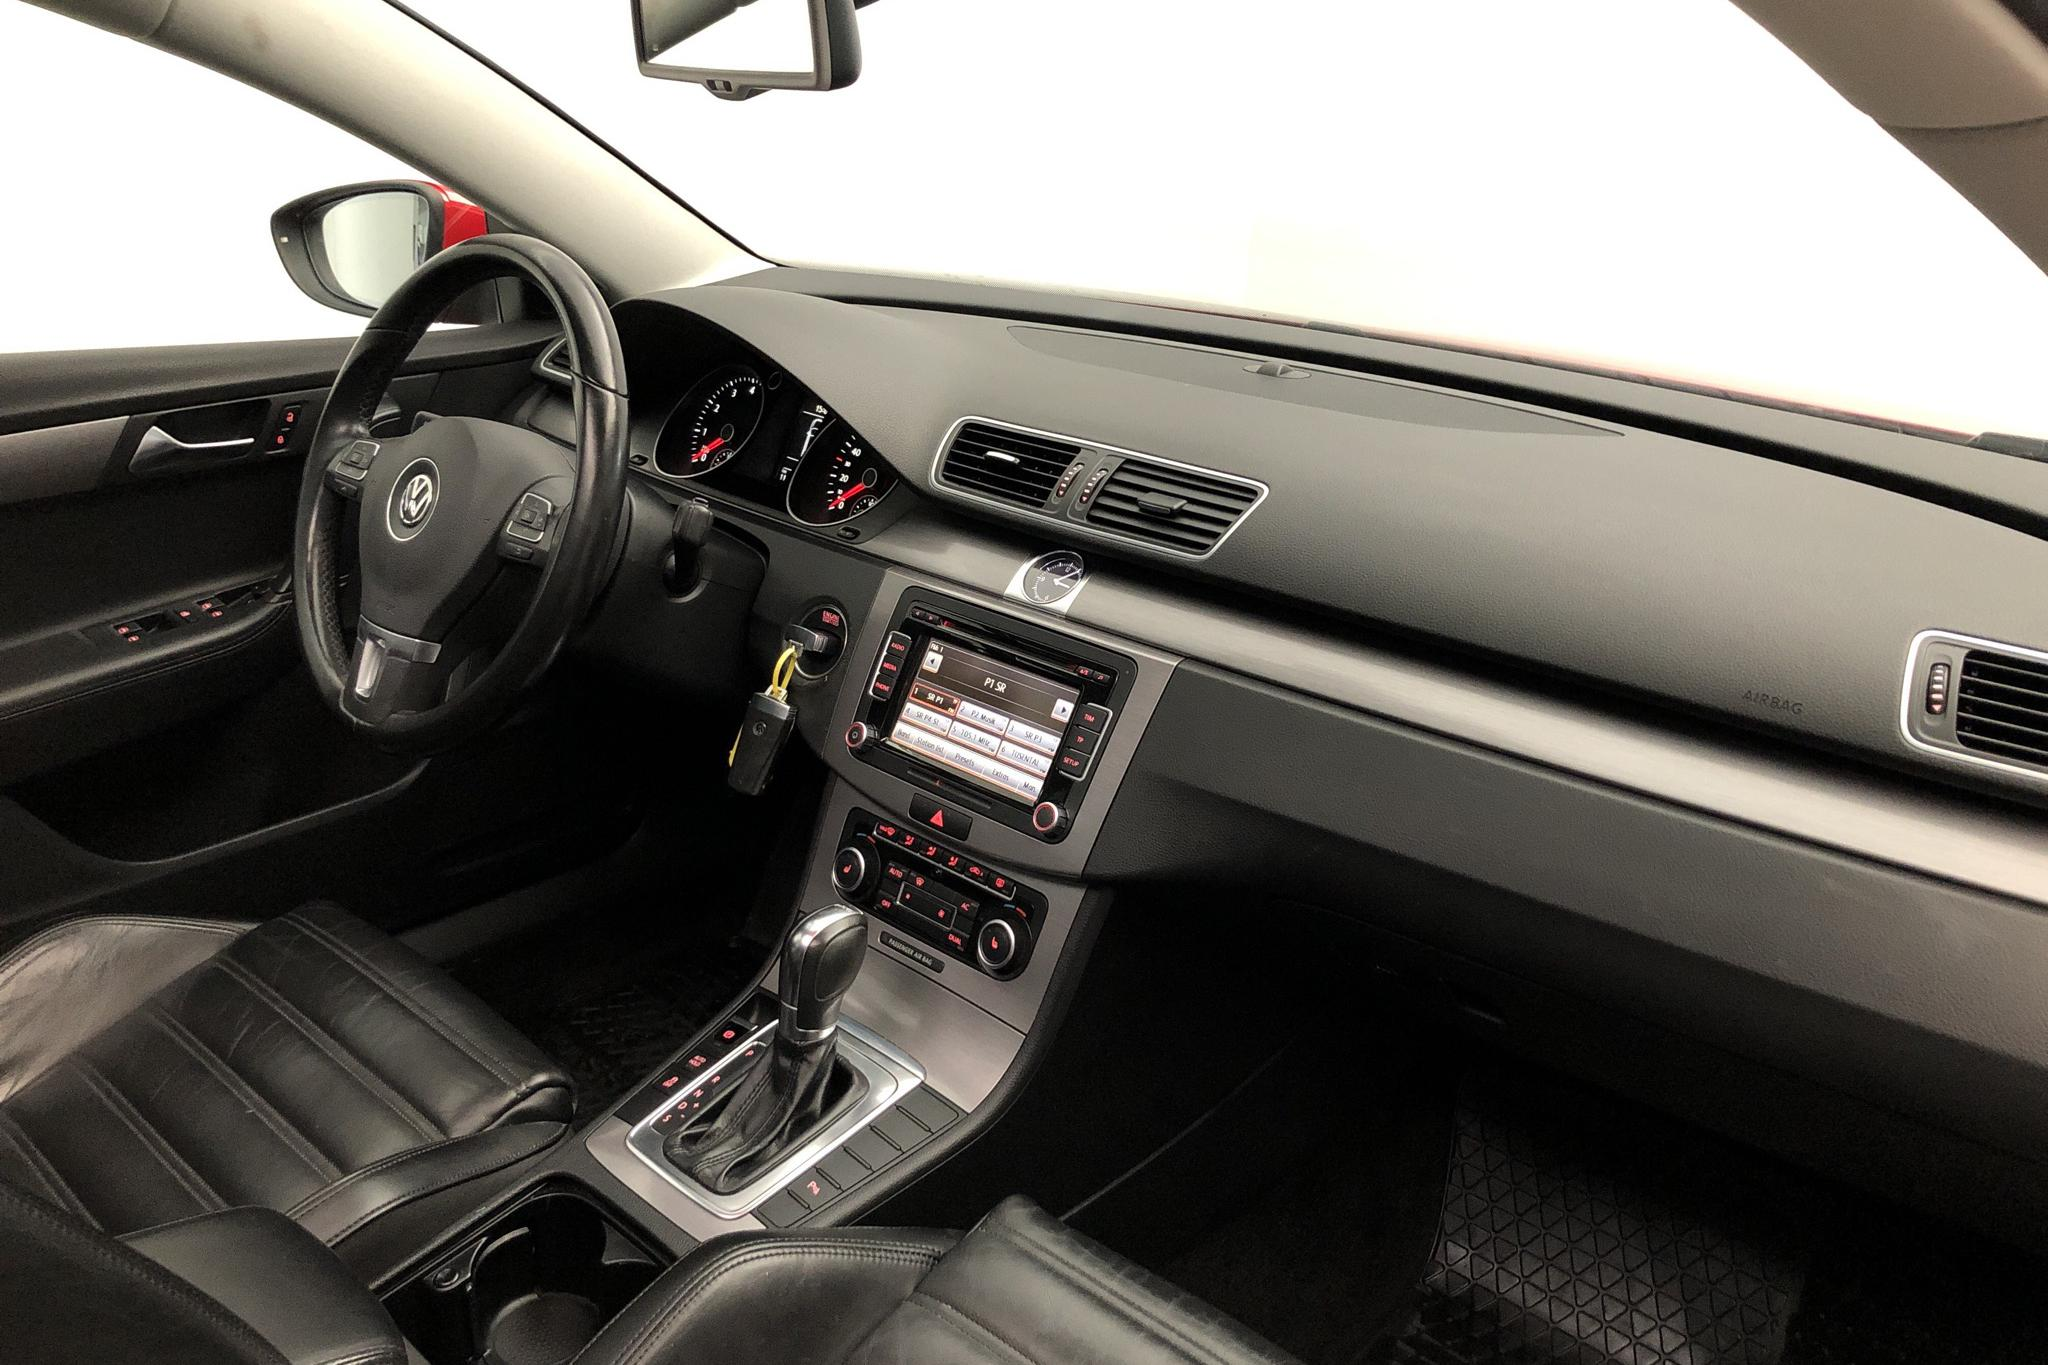 VW Passat 1.4 TSI EcoFuel Variant (150hk) - 111 950 km - Automatic - red - 2012